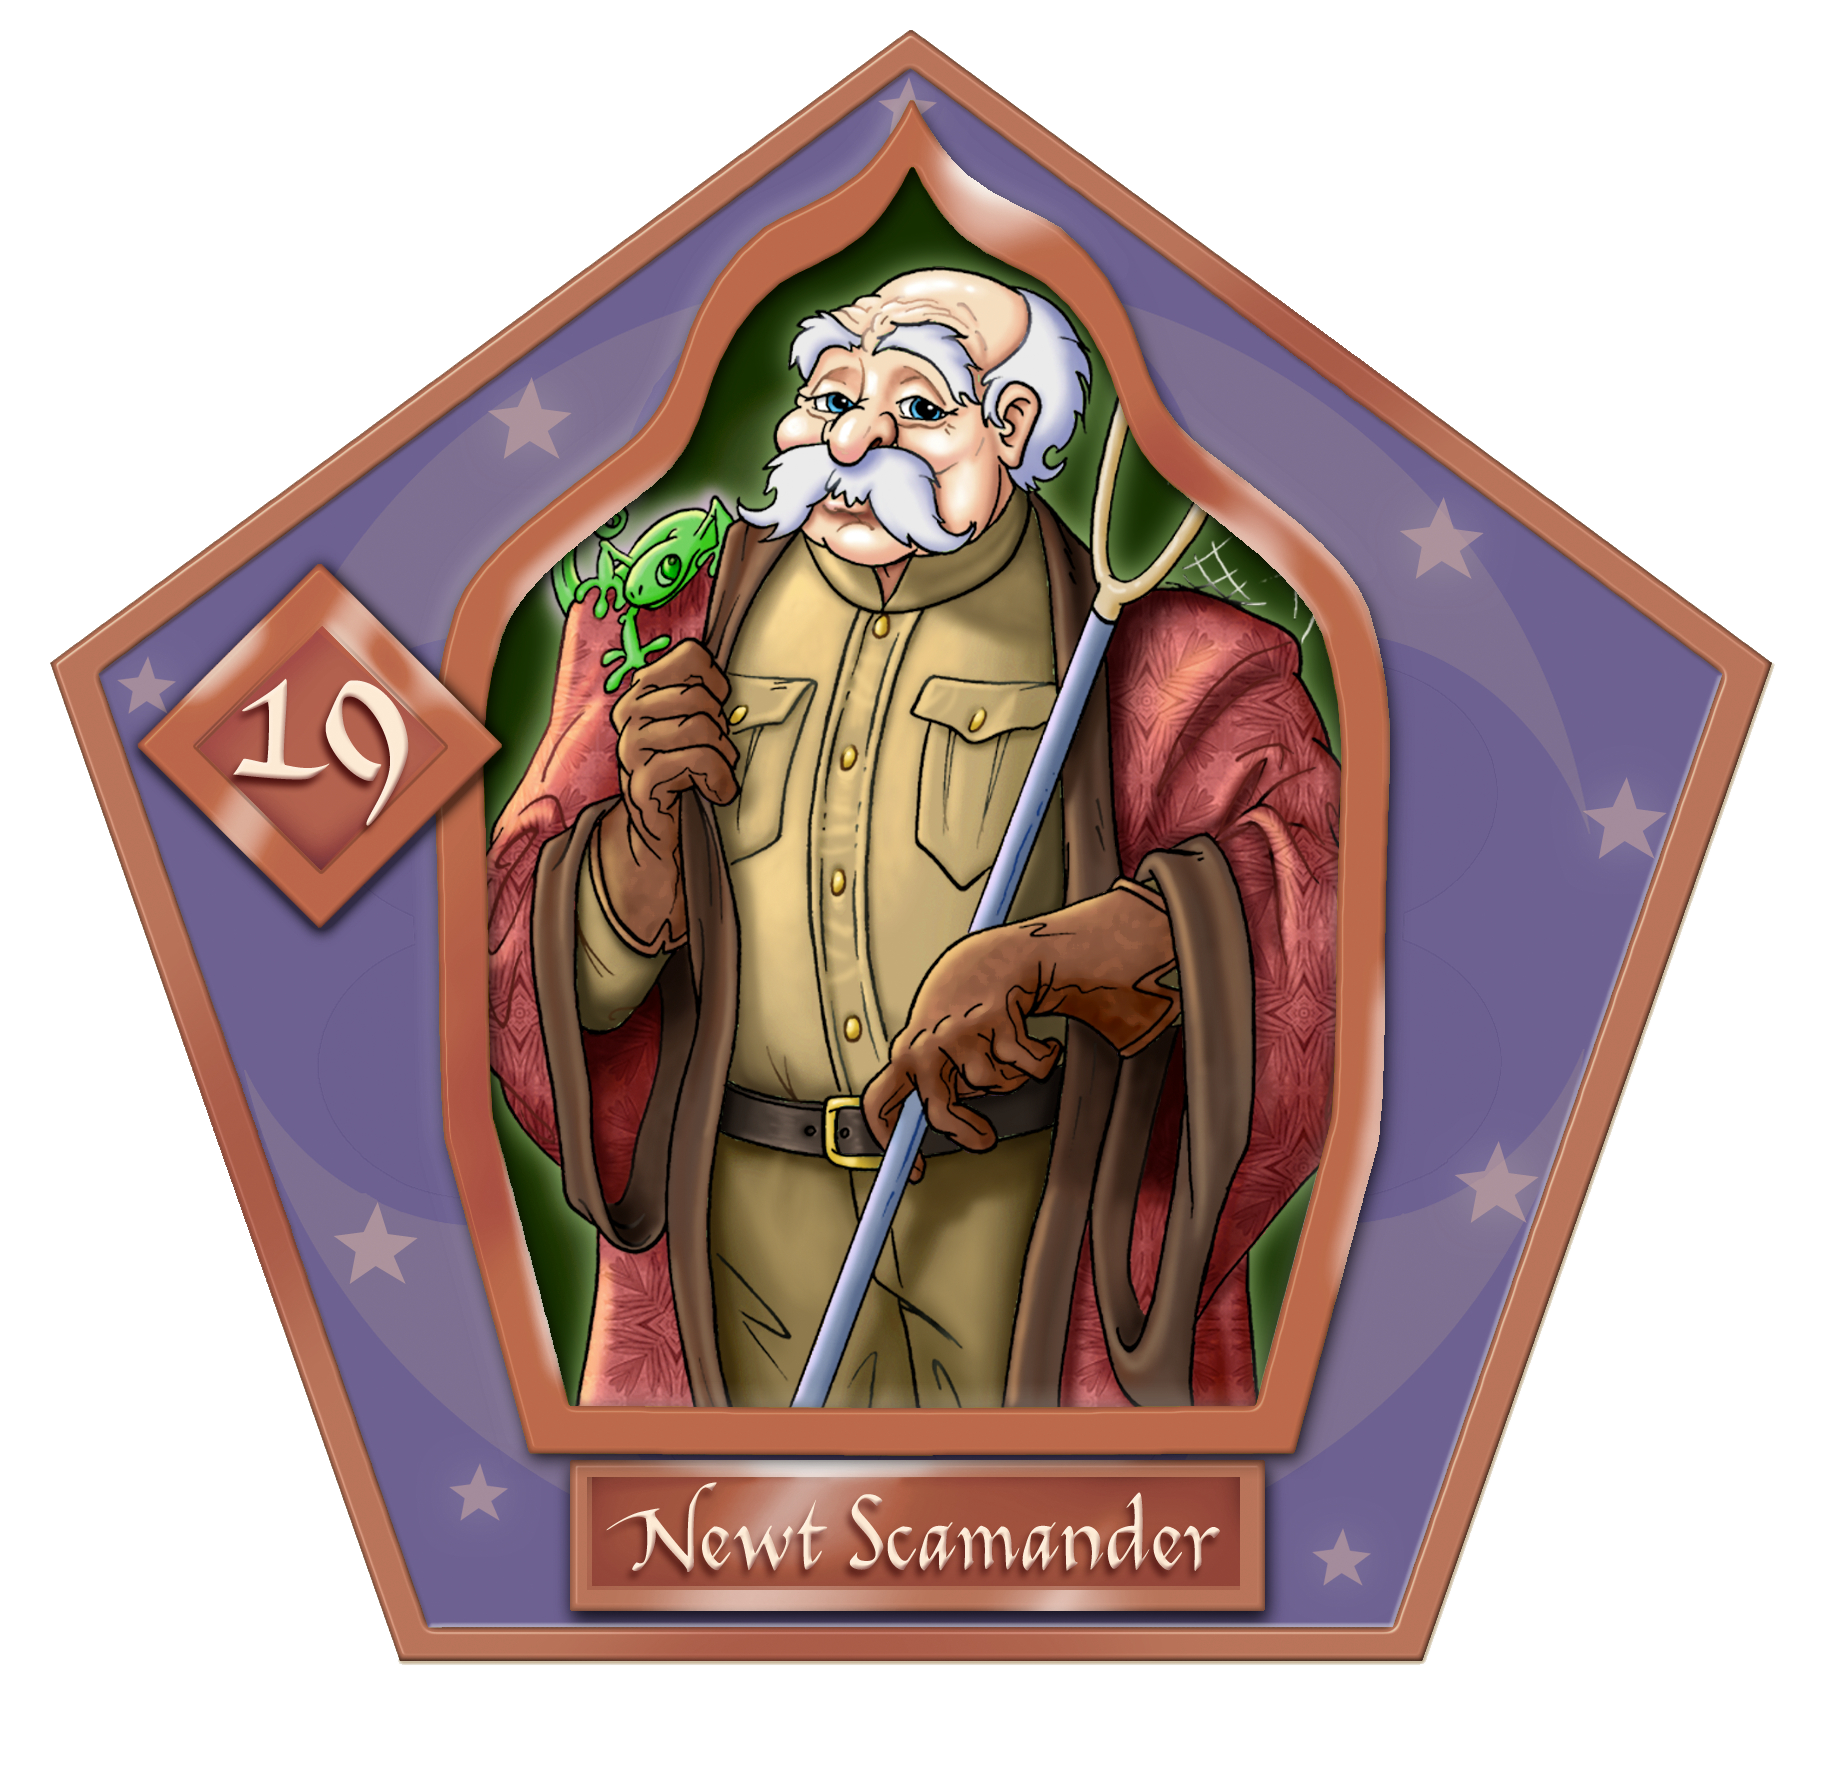 File:Newt Scamander-19-chocFrogCard.png